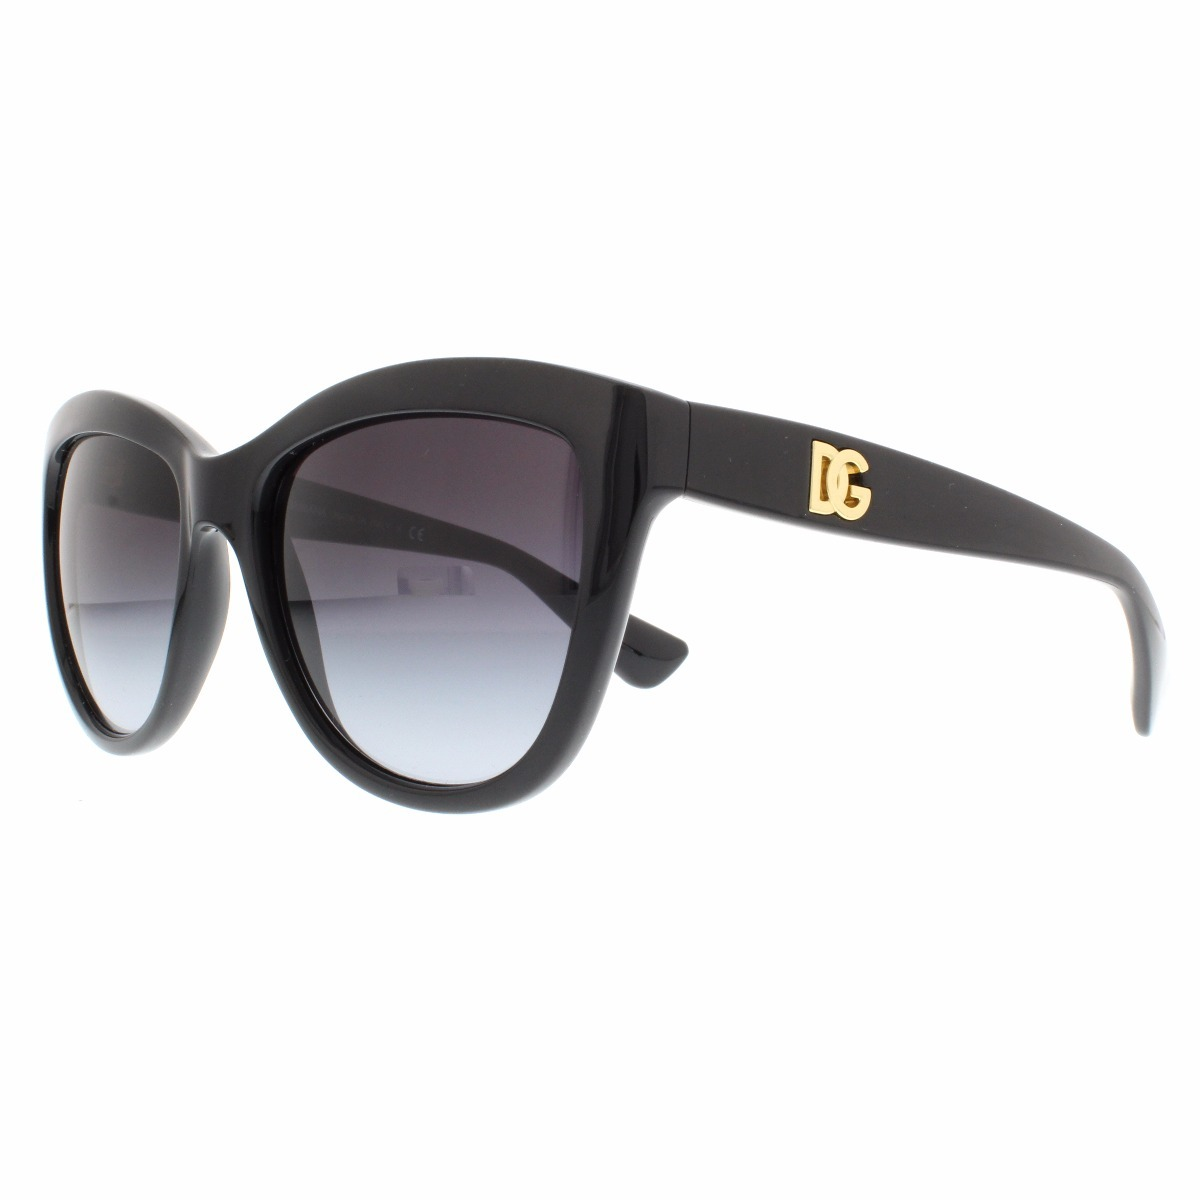 Lentes Sol Dolce & Gabbana 6087 501/8g Italia 55mm - $ 86.000 en ...